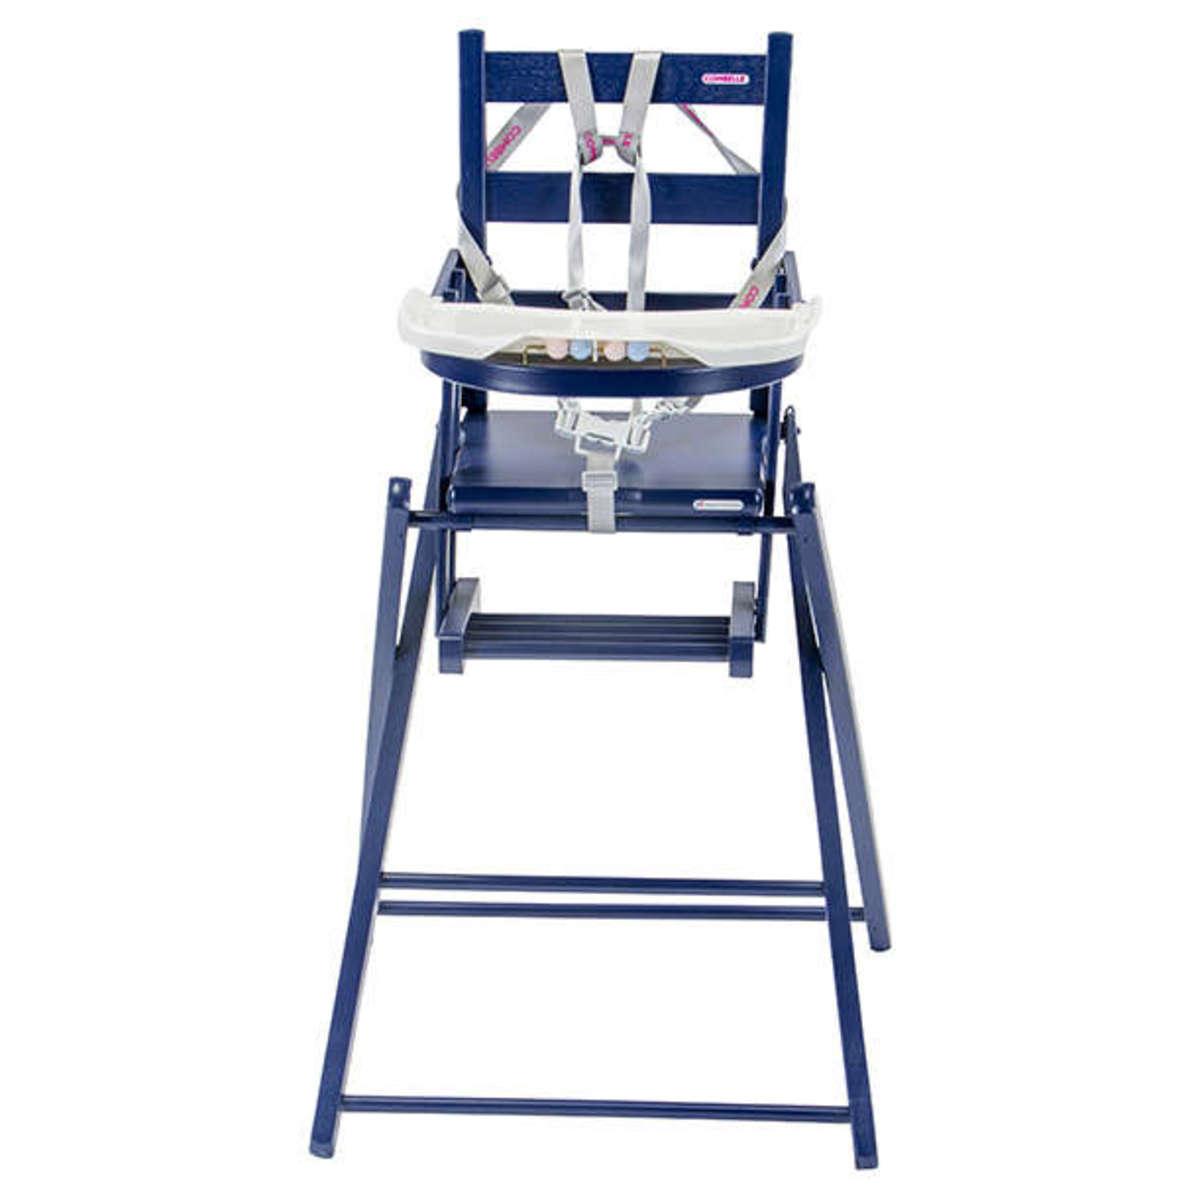 combelle chaise haute extra pliante sarah laqu bleu chaise haute combelle sur l 39 armoire de b b. Black Bedroom Furniture Sets. Home Design Ideas